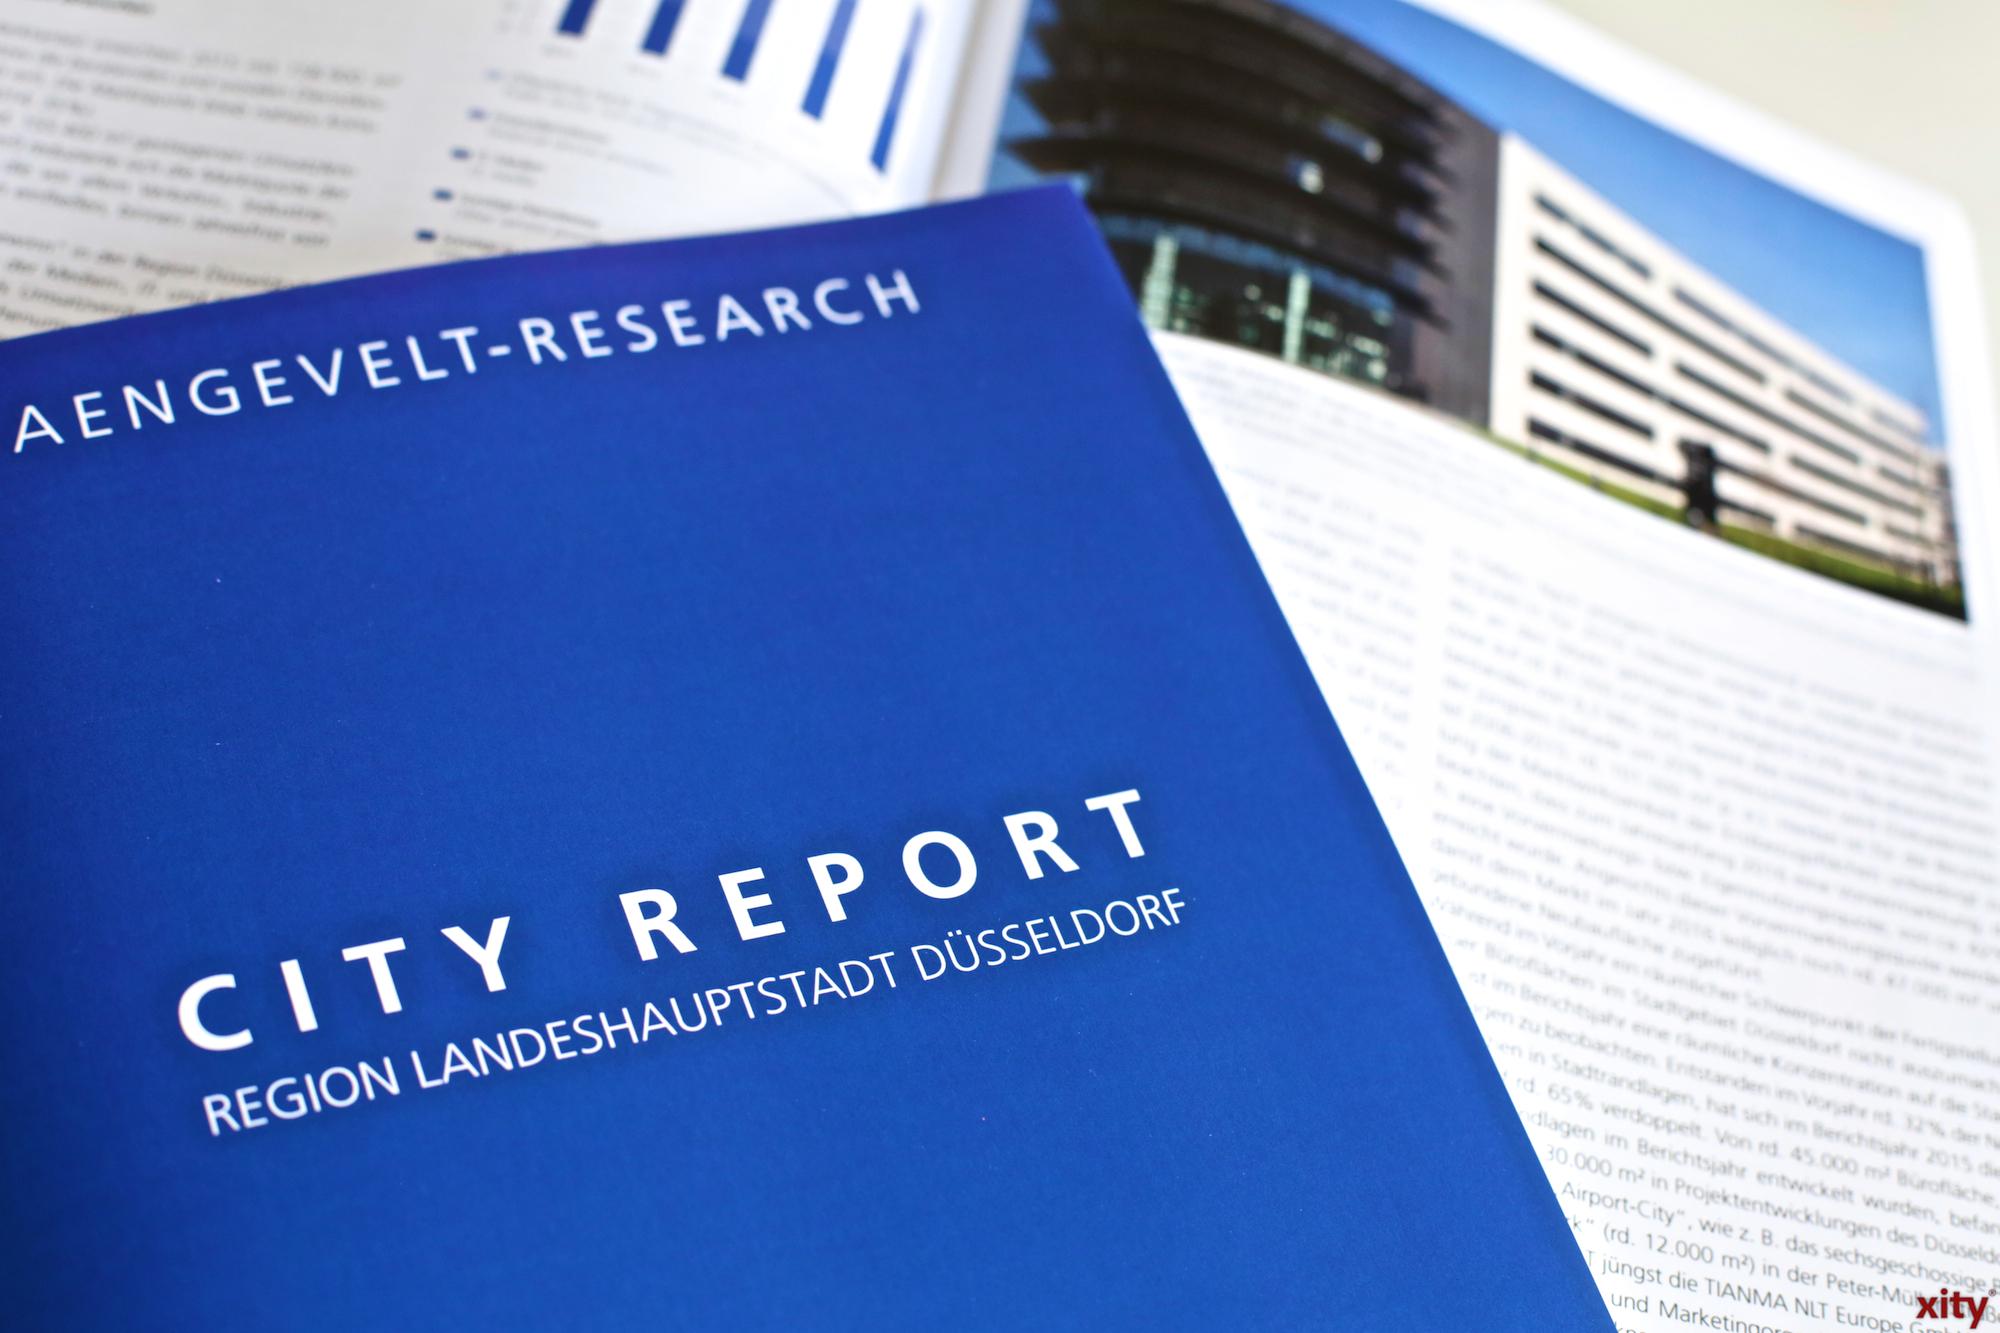 Aengevelt City-Report 2016 vorgestellt (Foto: xity)